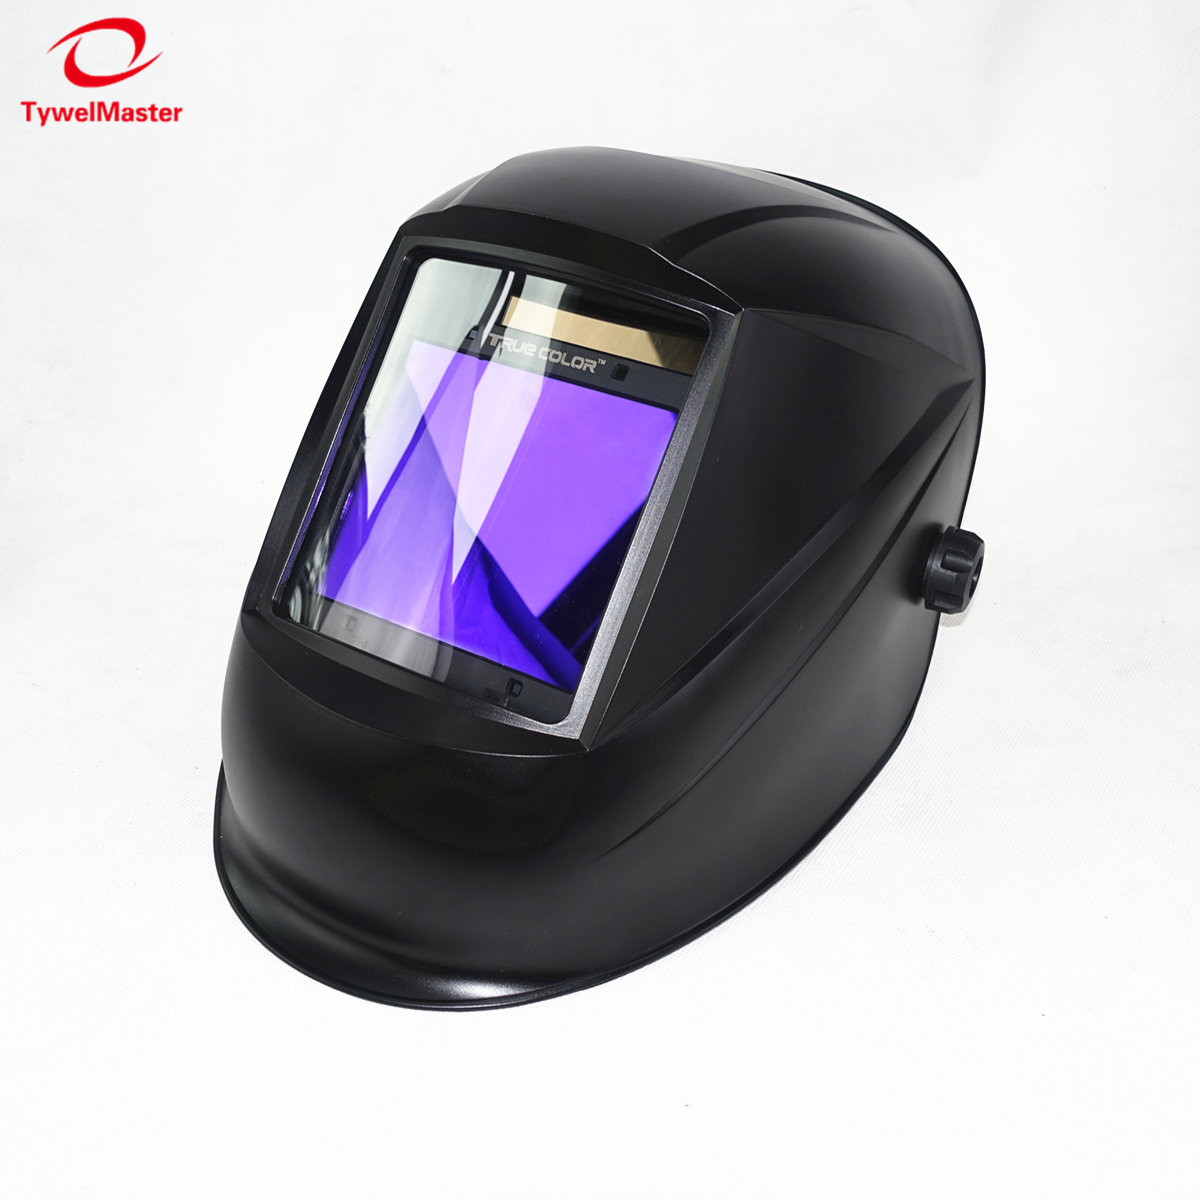 "Auto Darkening Welding Mask View Size 98x88mm 3.86x2.46"" DIN 4-13 4 Sensors CE ANSI AS/NZS Welding Helmet"